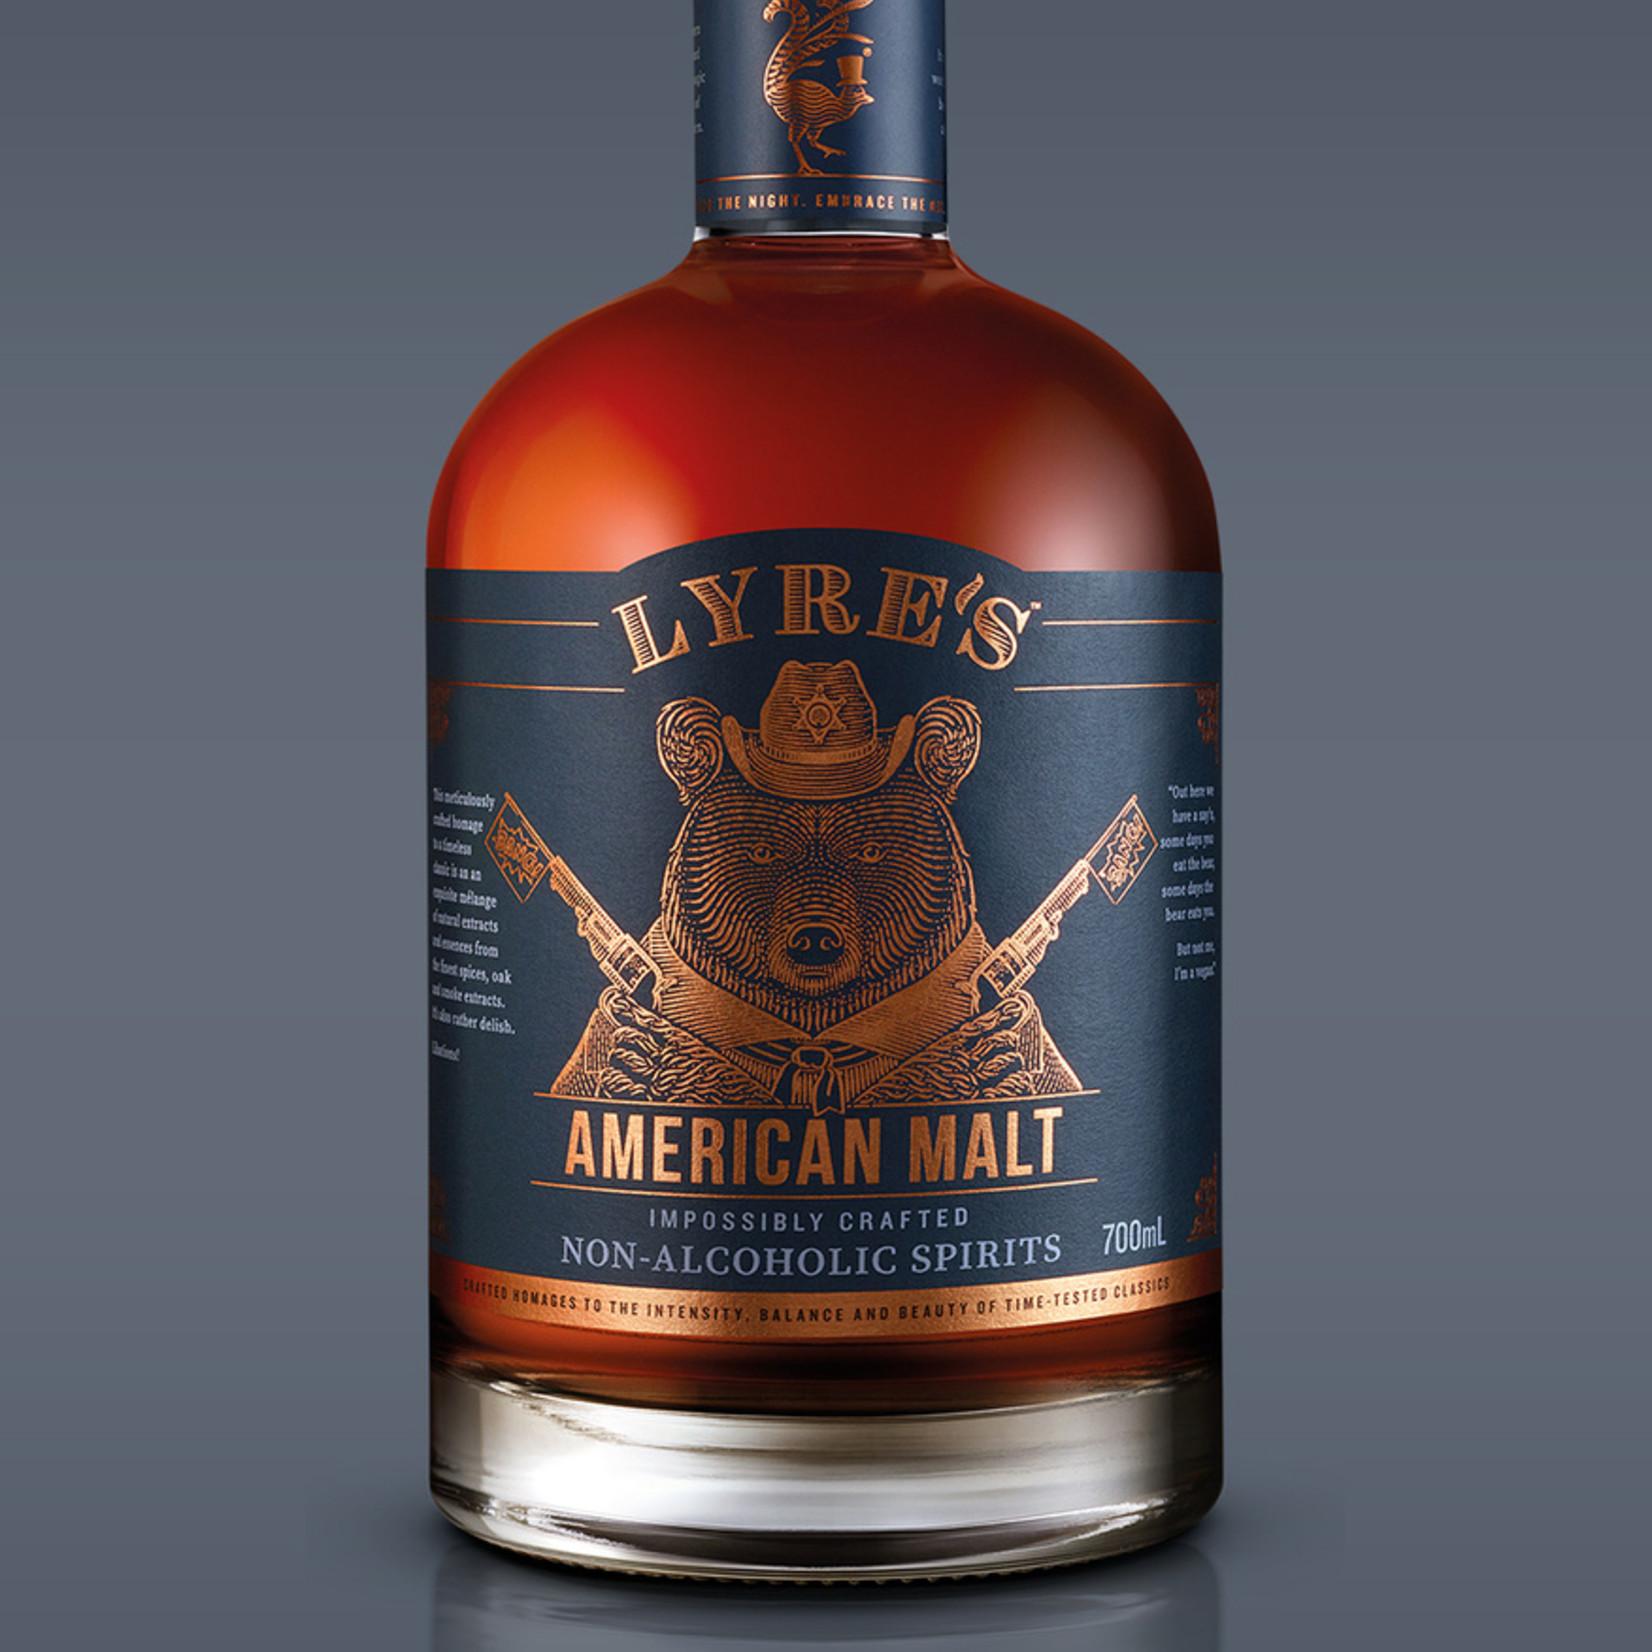 Lyre's Lyre's American Malt